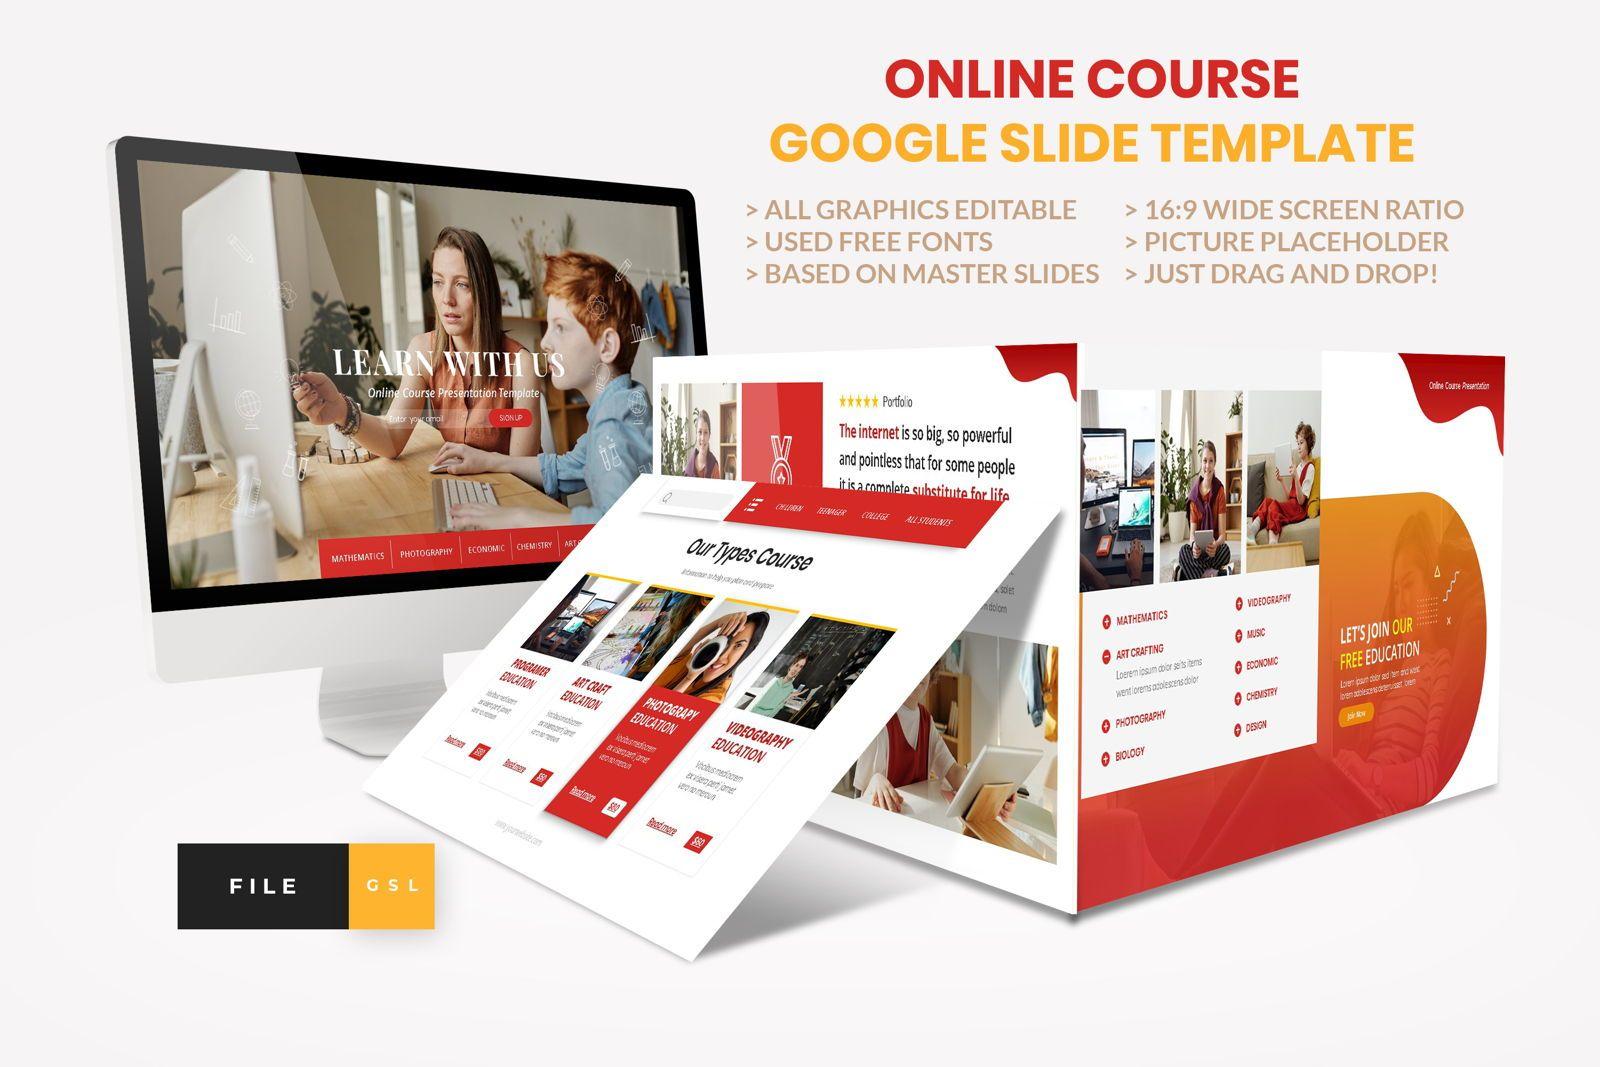 Online Course - Education Google Slide Template, 08574, Presentation Templates — PoweredTemplate.com